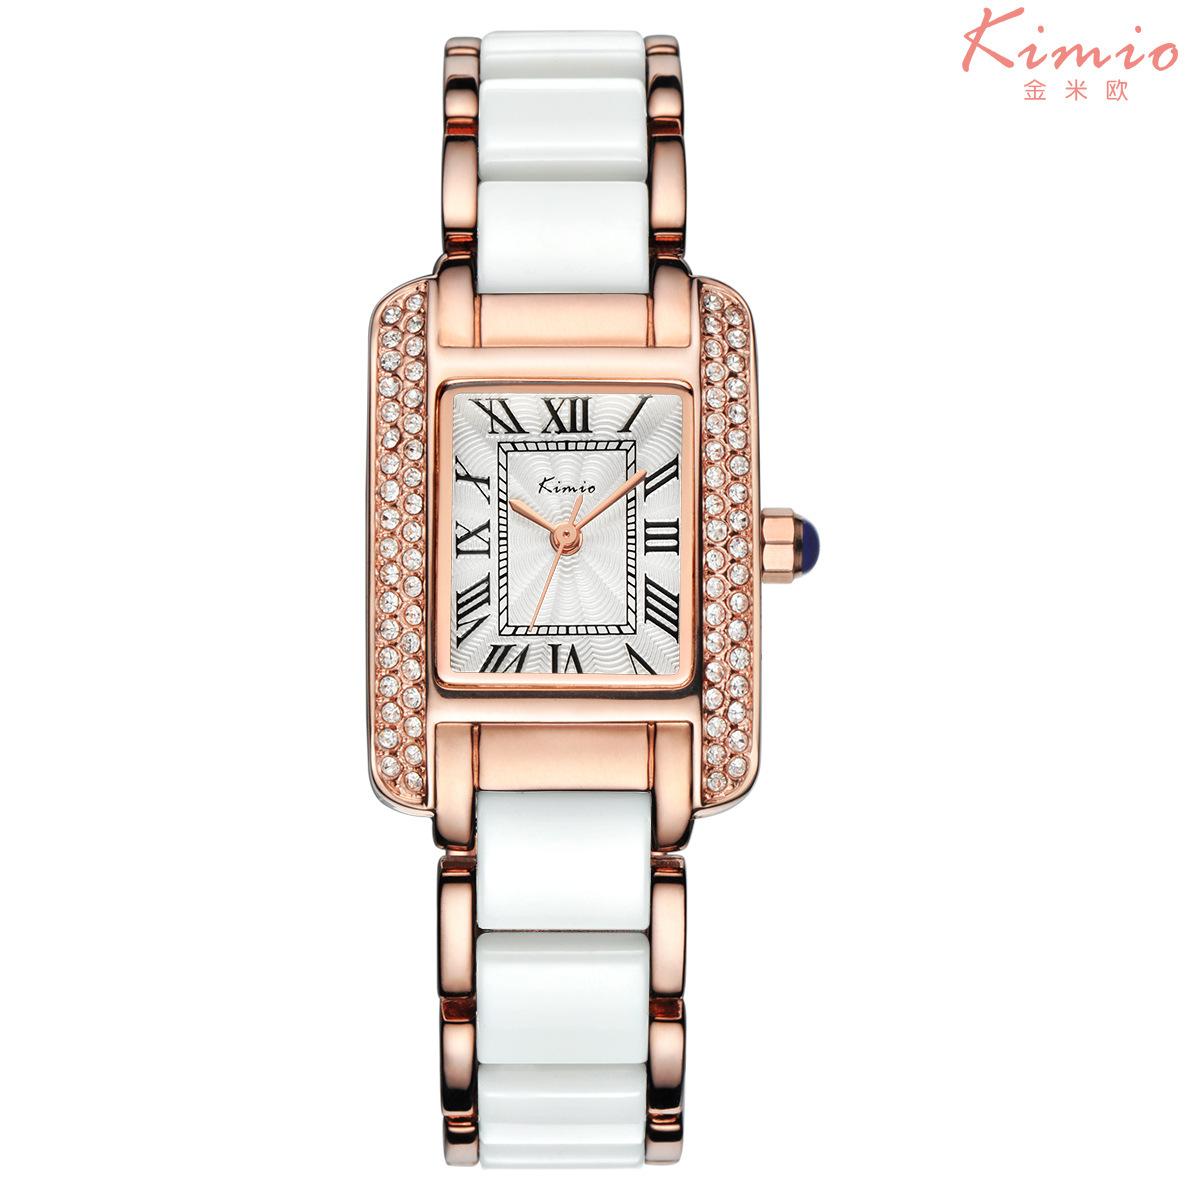 2017 womens Watches Top Brand Luxury Gold Watch Male Fashion Wrist Watch unique brief watches